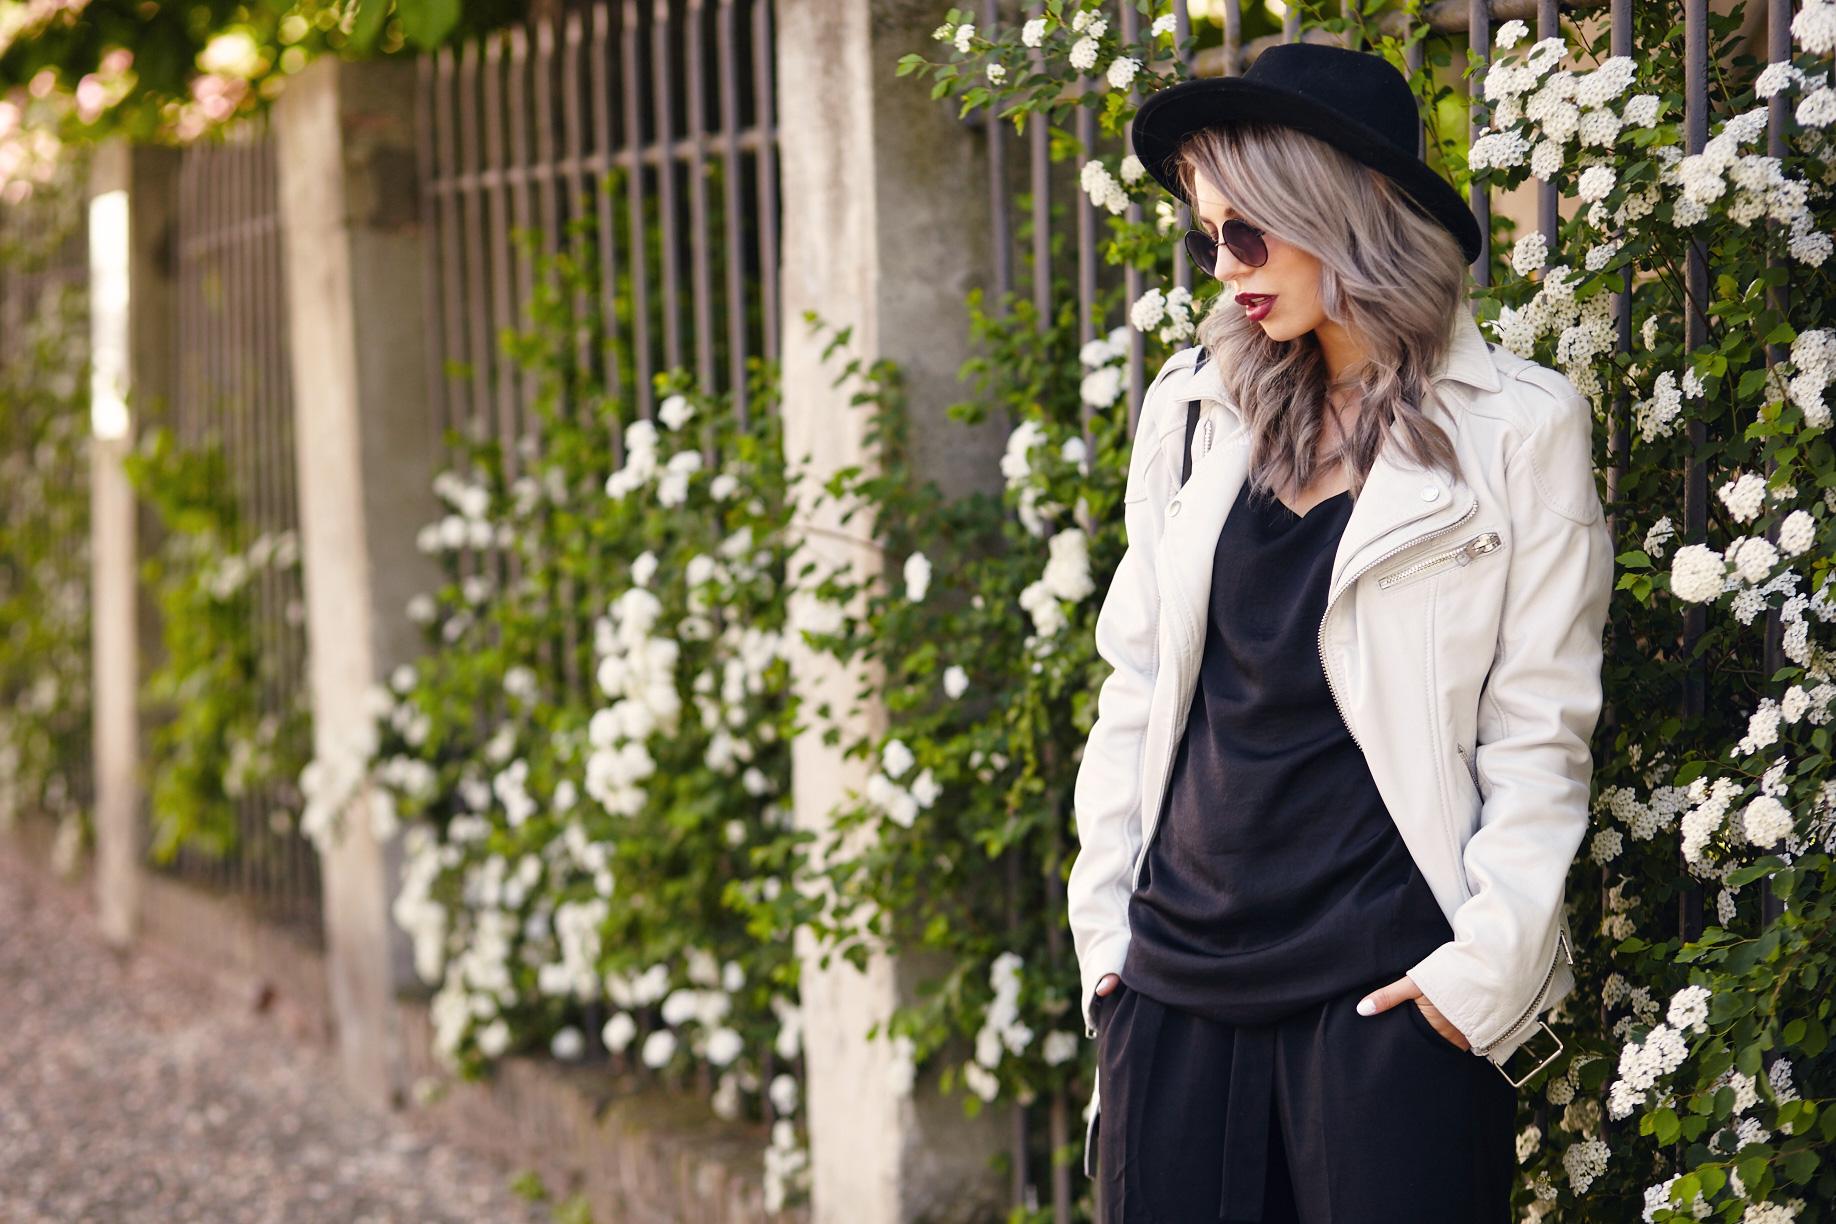 The White Leather Jacket